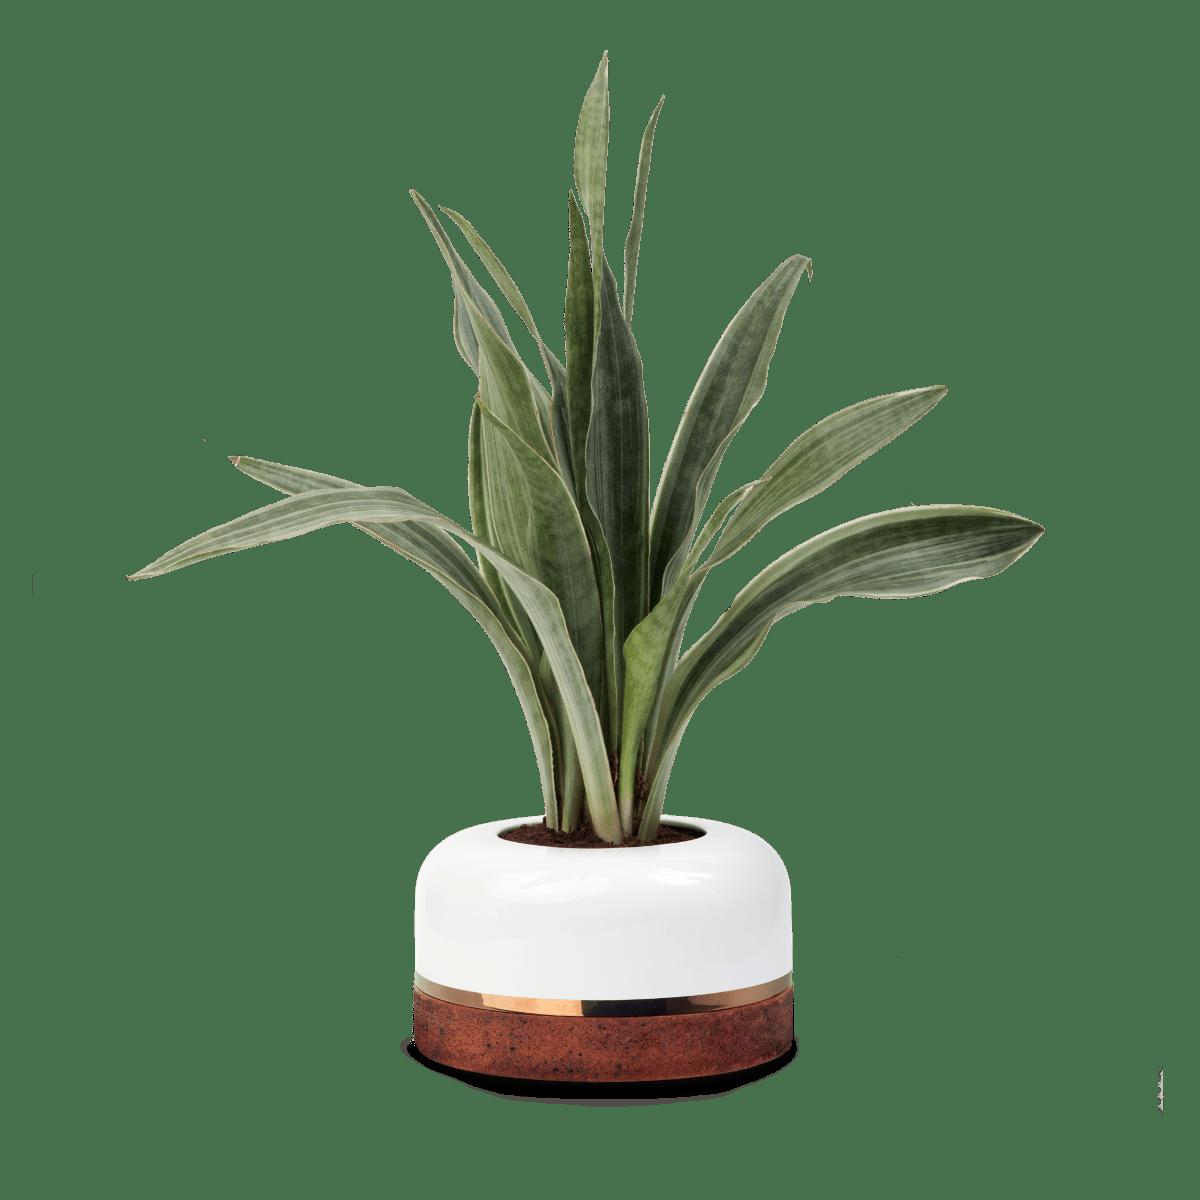 maceta de cerámica elegante